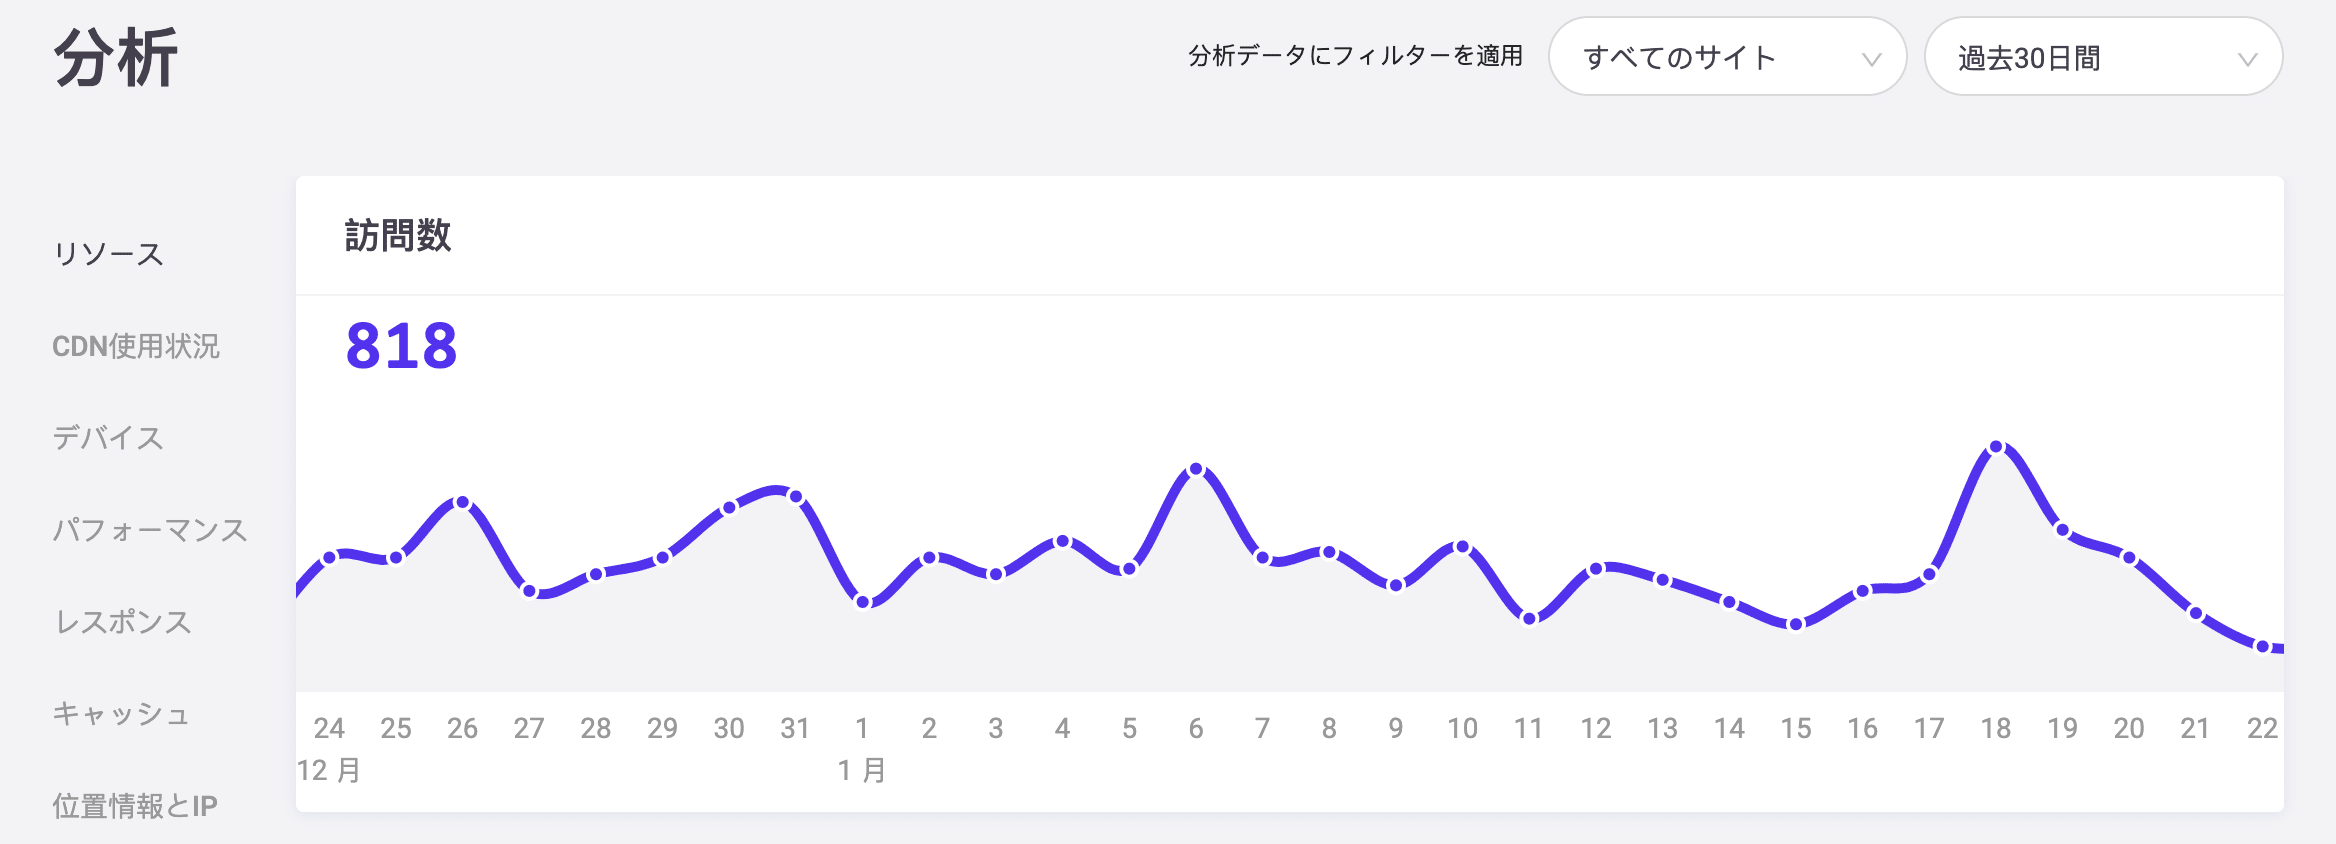 WordPressサイトにおけるトラフィックの急増